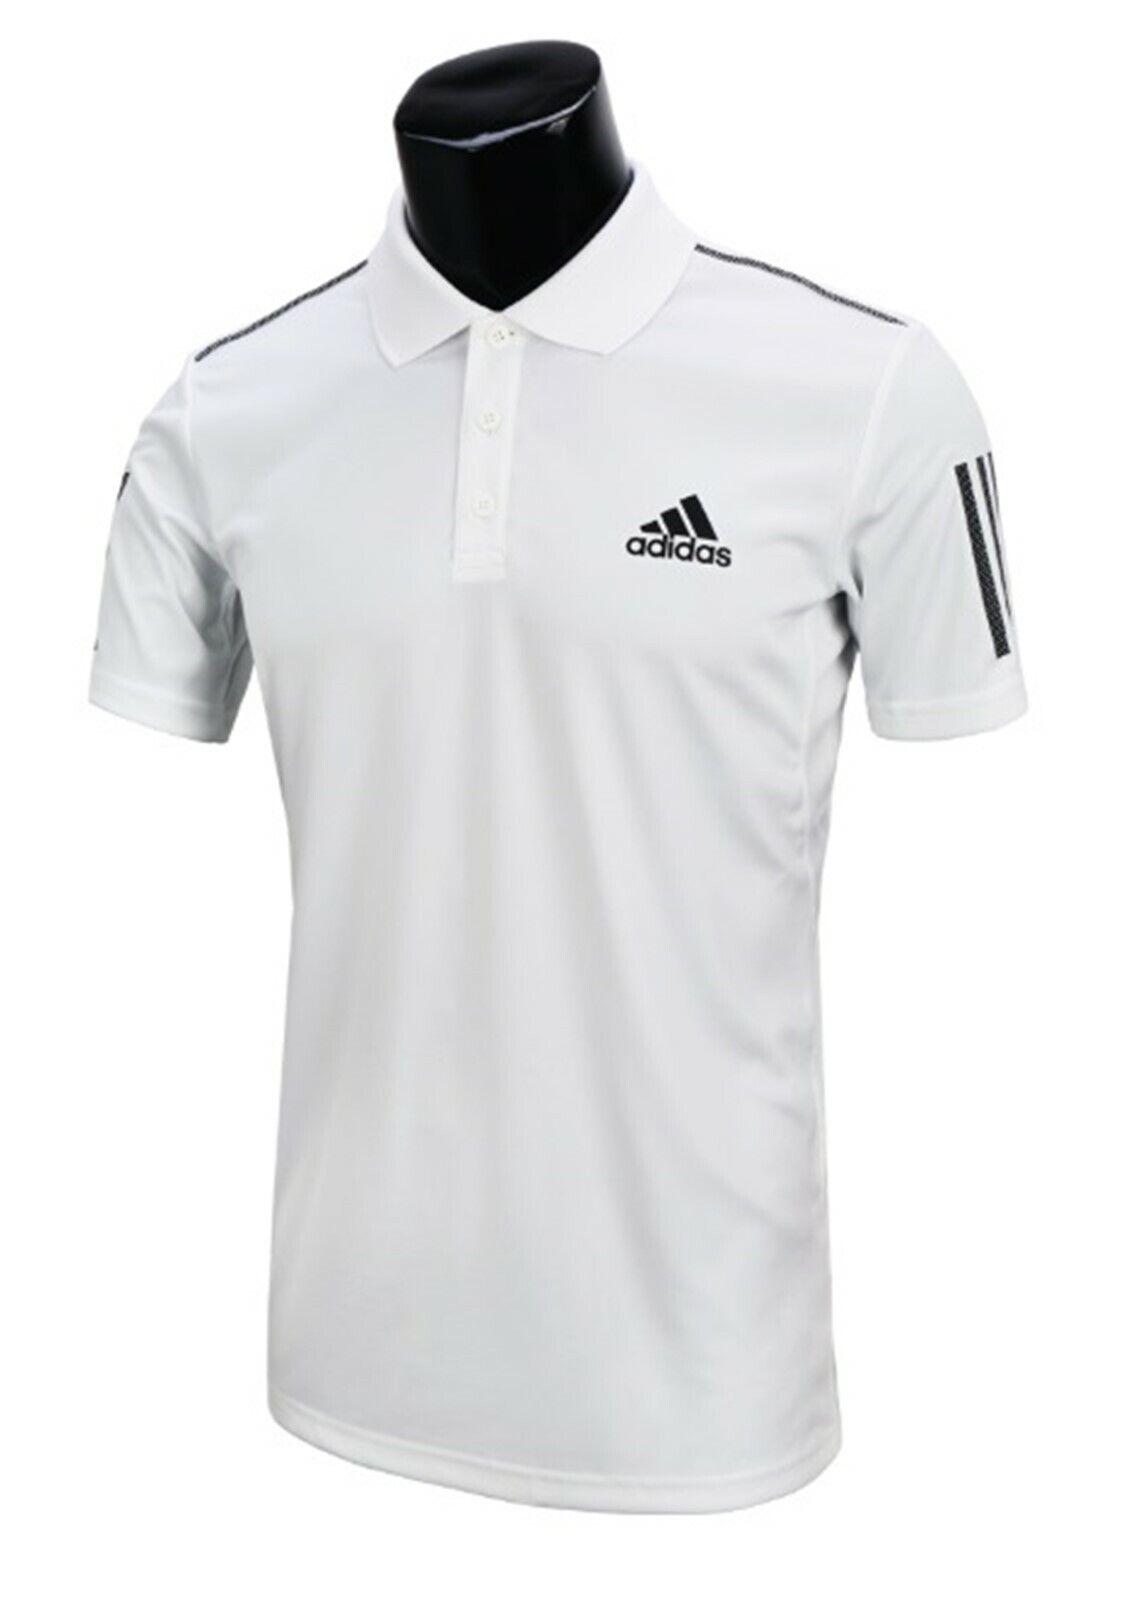 Adidas Men CLUB 3S Polo T-Shirts S S Jersey White Training Tee GYM Shirt DU0849